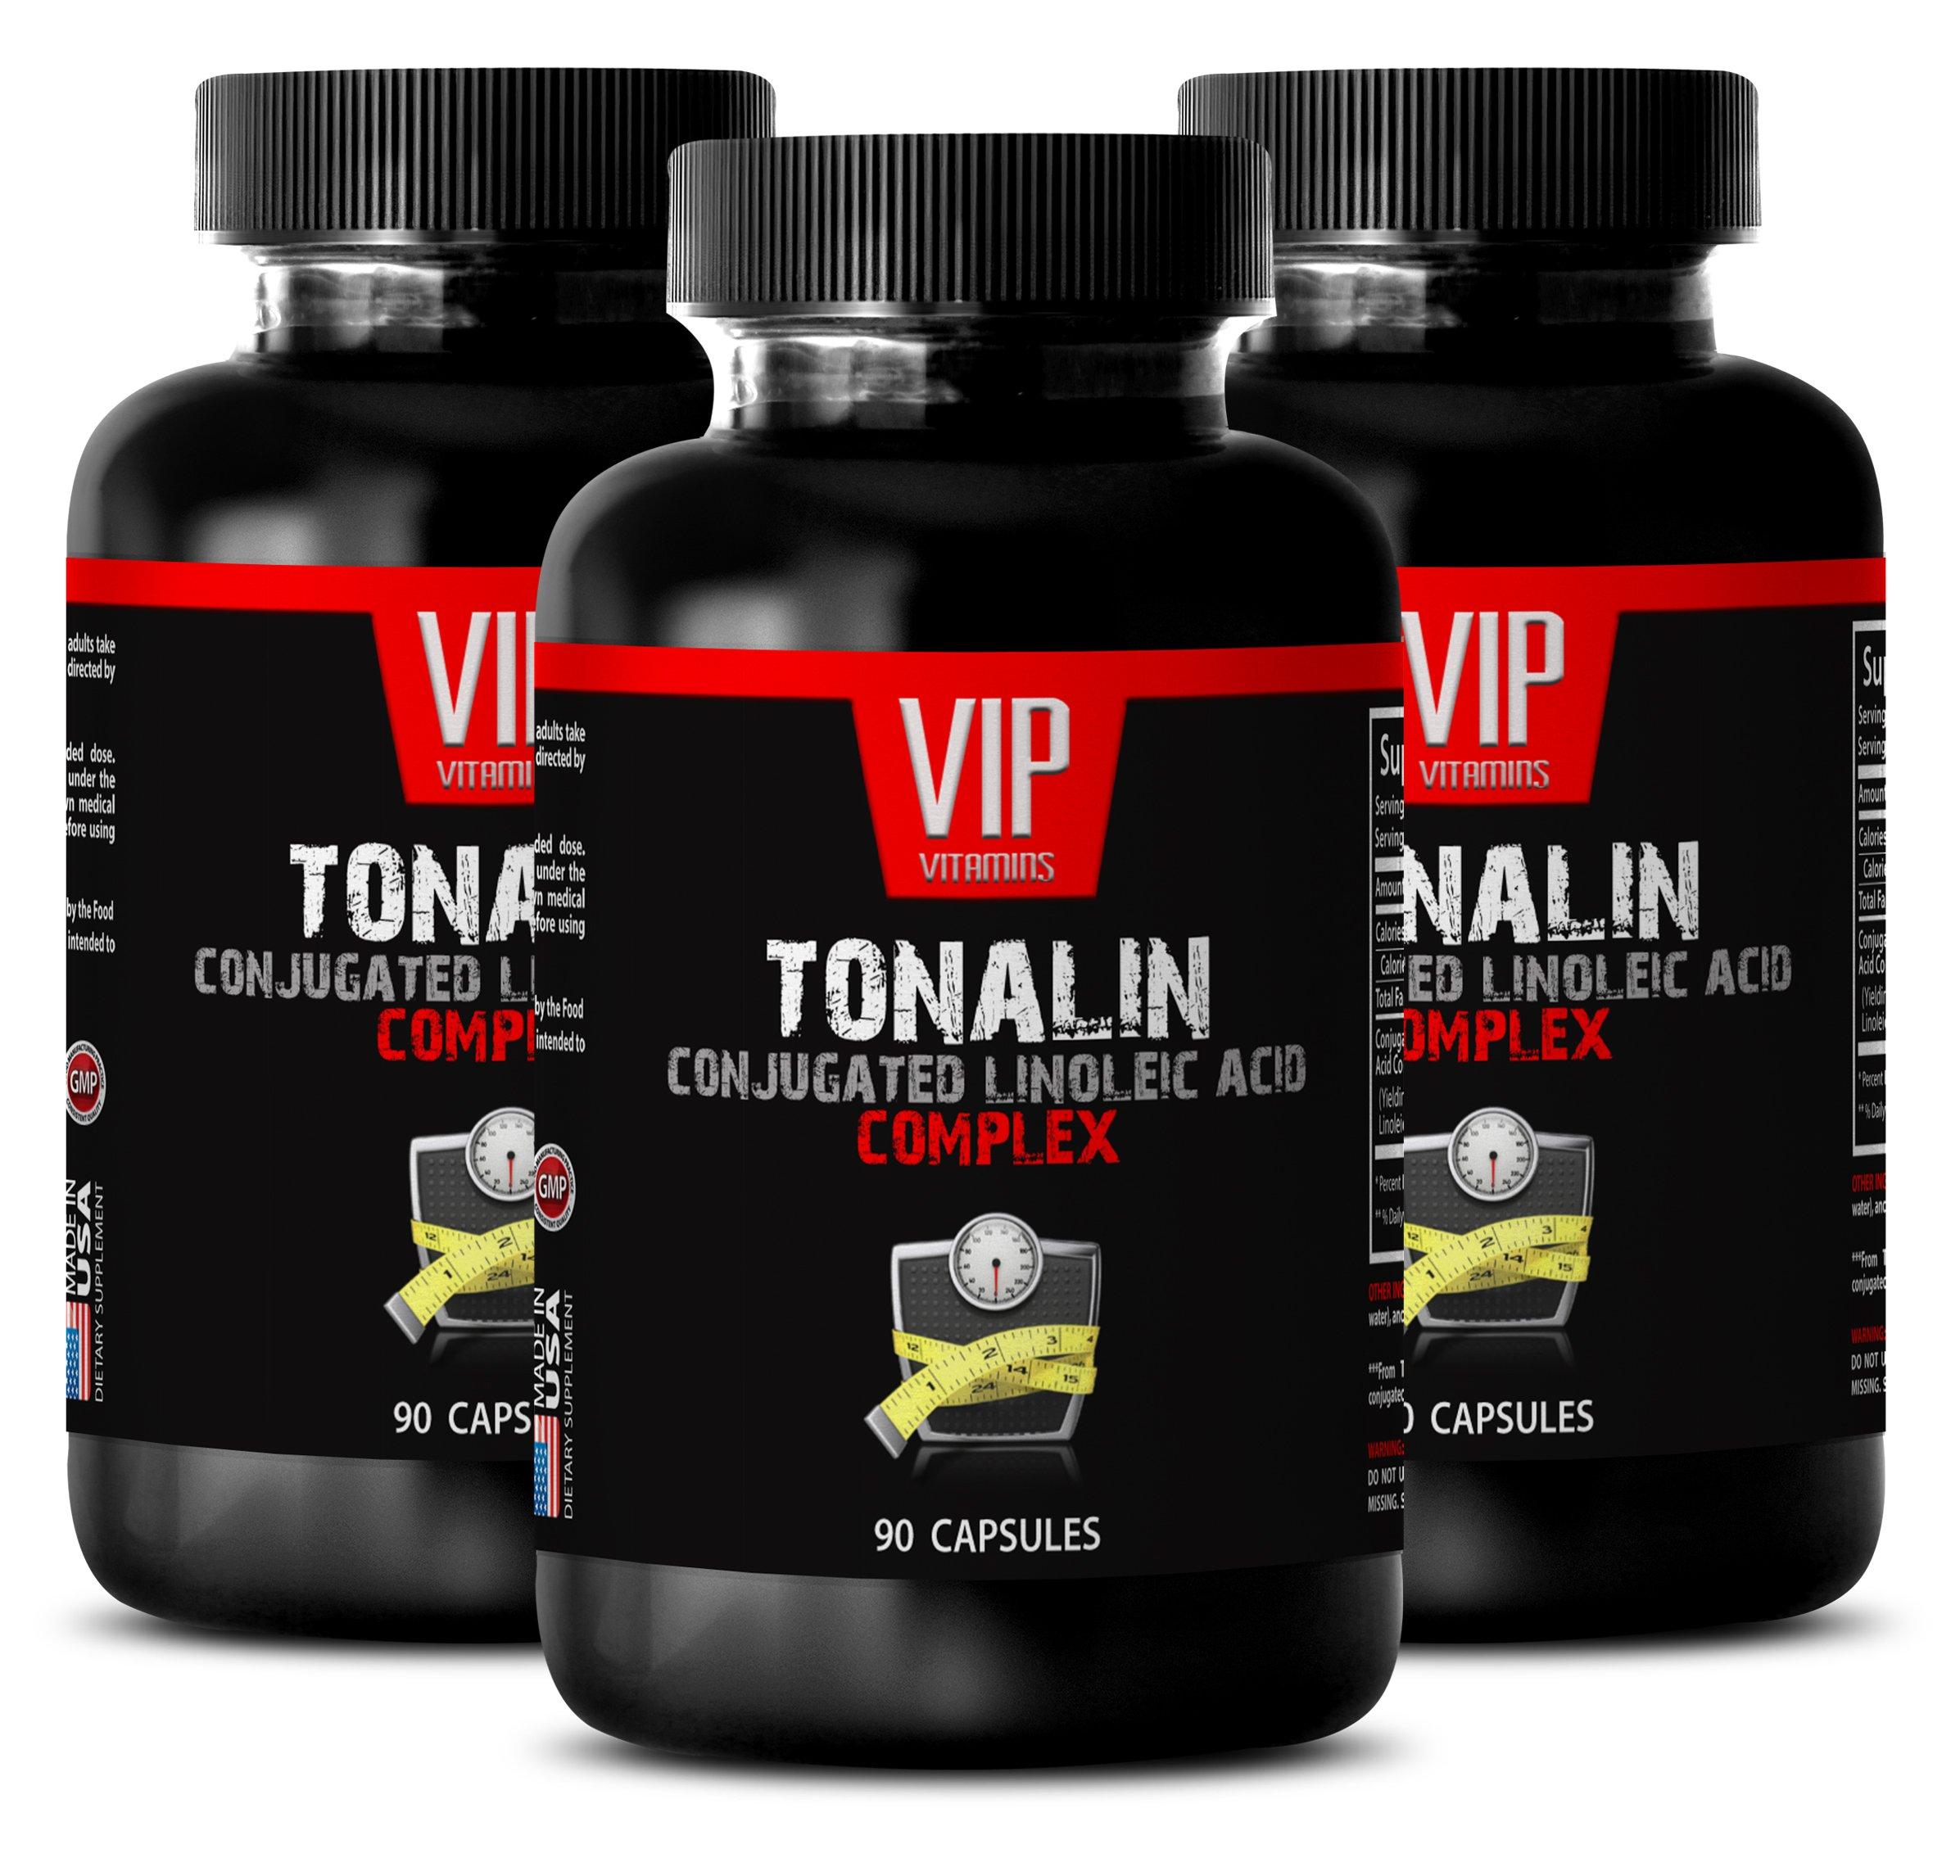 Natural workout supplements - TONALIN Conjugated Linoleic Acid Complex - Energy supplement for men - 3 bottles 270 Capsules